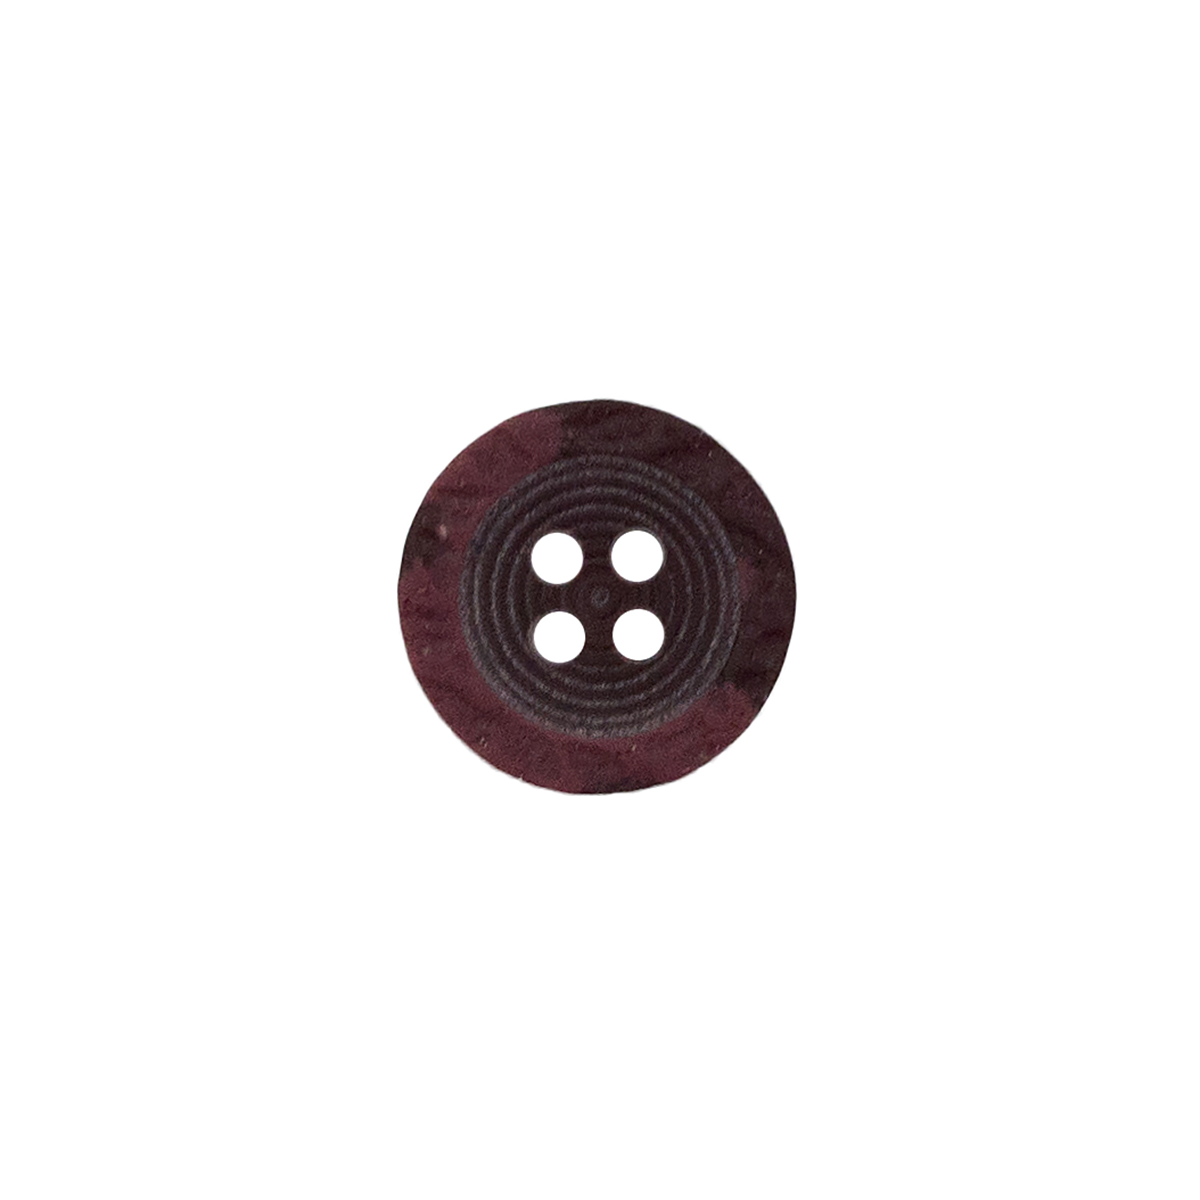 0313 4079A Пуговица 24L 36шт (C048 бордовый)